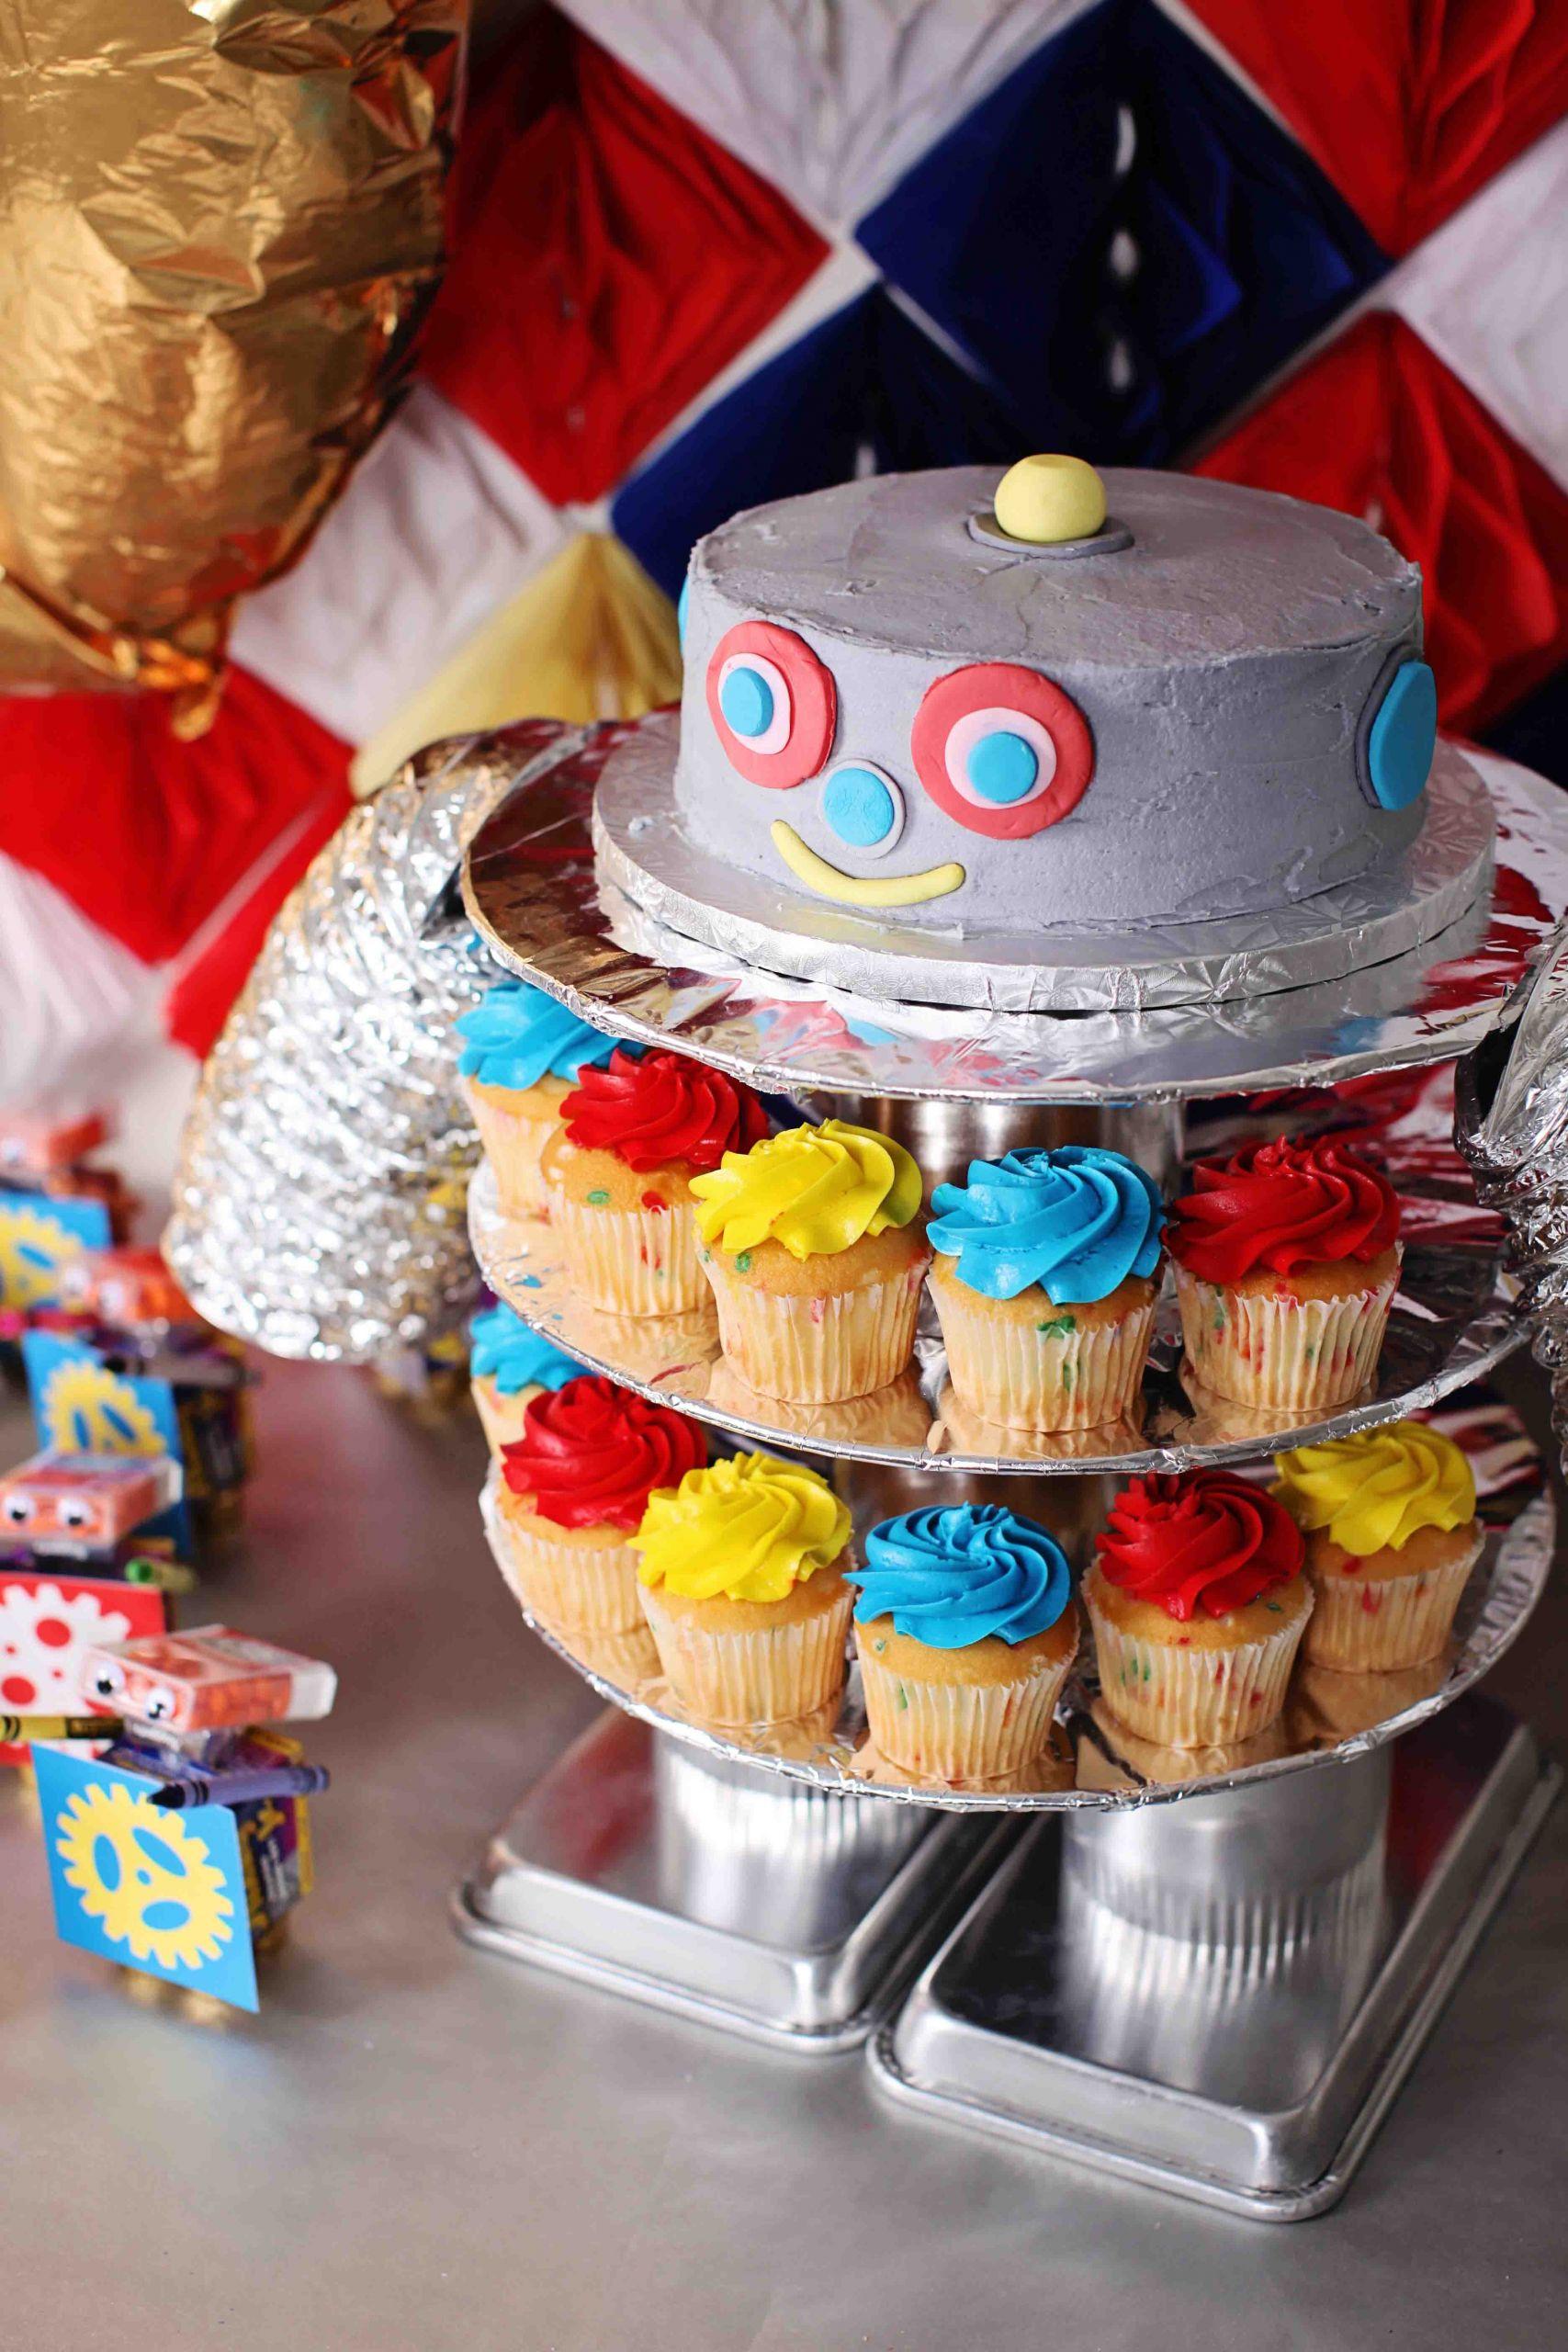 Kids Birthday Party Decoration Ideas  Boy s Birthday Party Ideas Robot Birthday